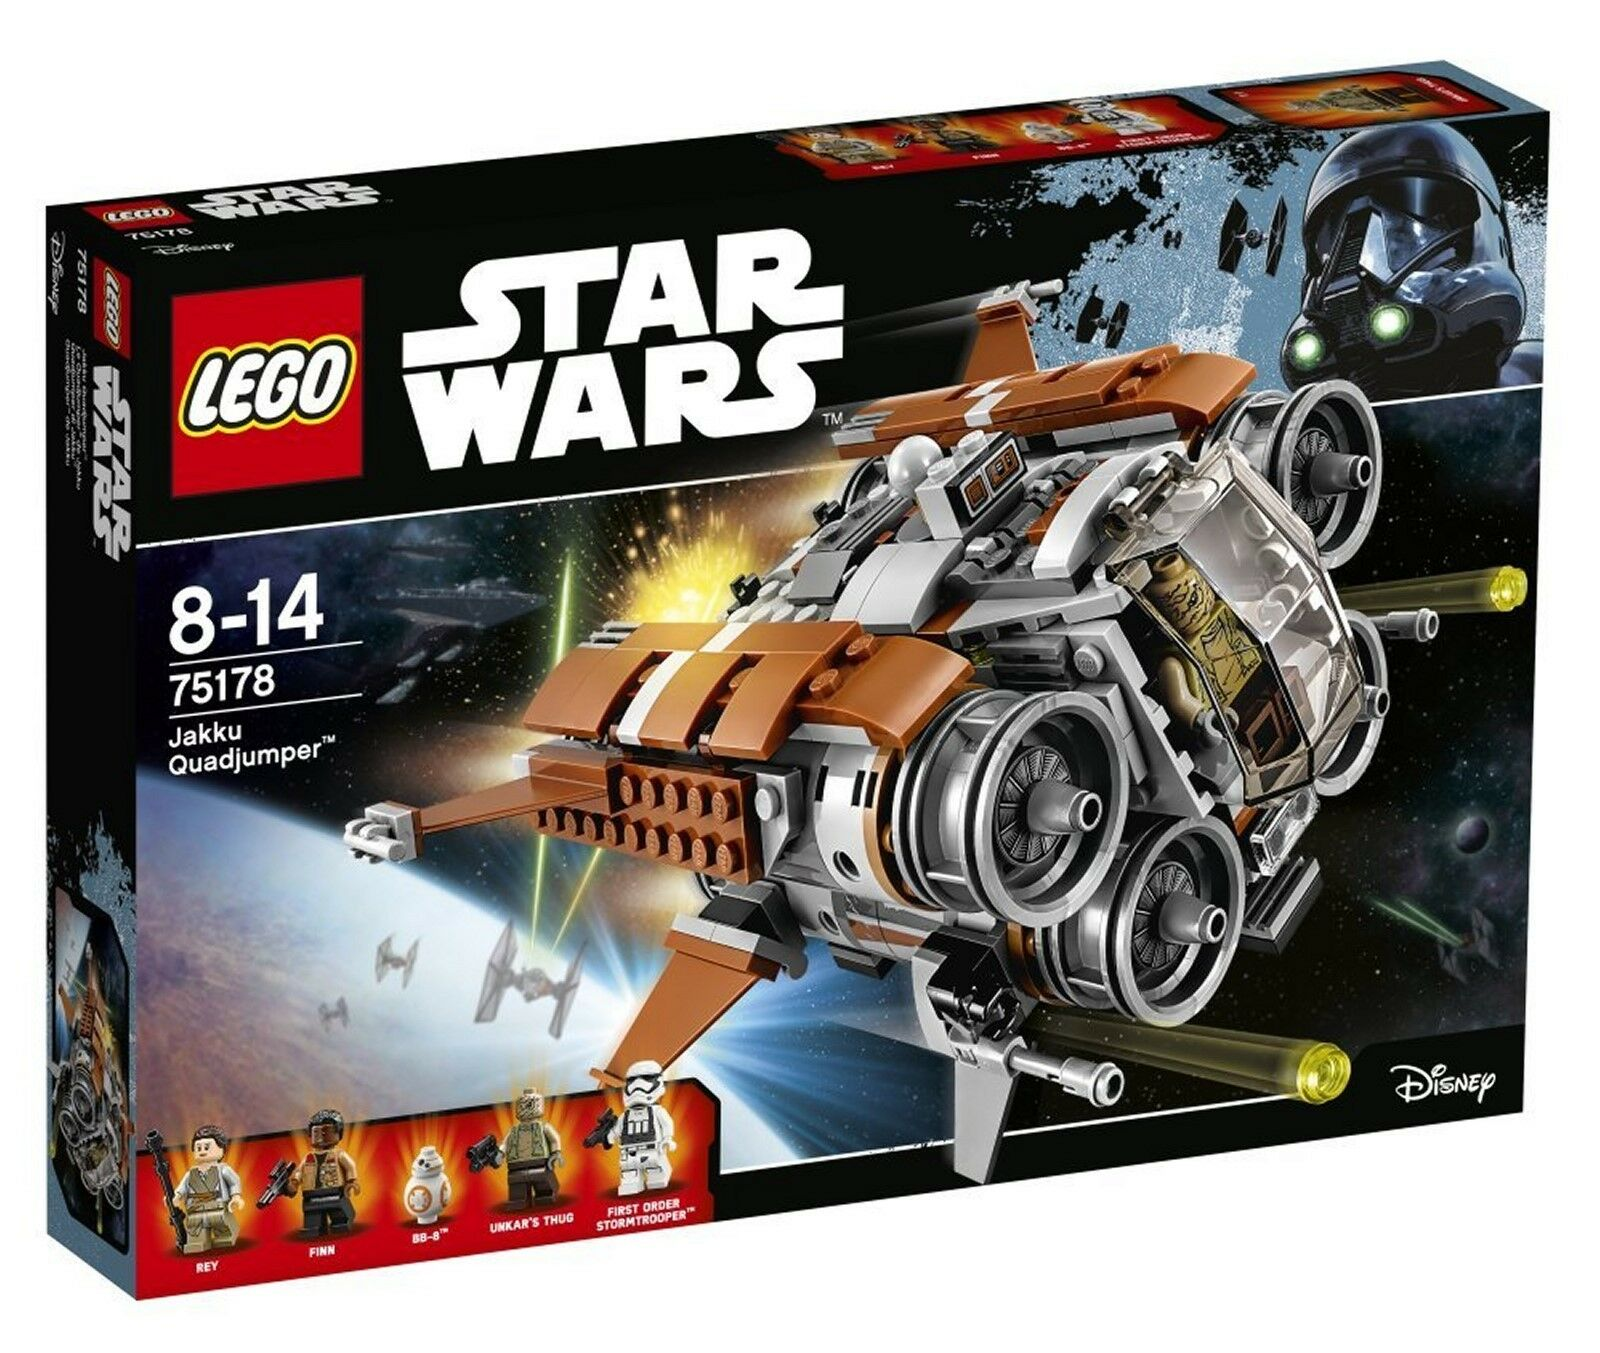 LEGO ® Star Wars ™ 75178-Jakku quadjumper ™ - 457 pièces Nu & neuf dans sa boîte